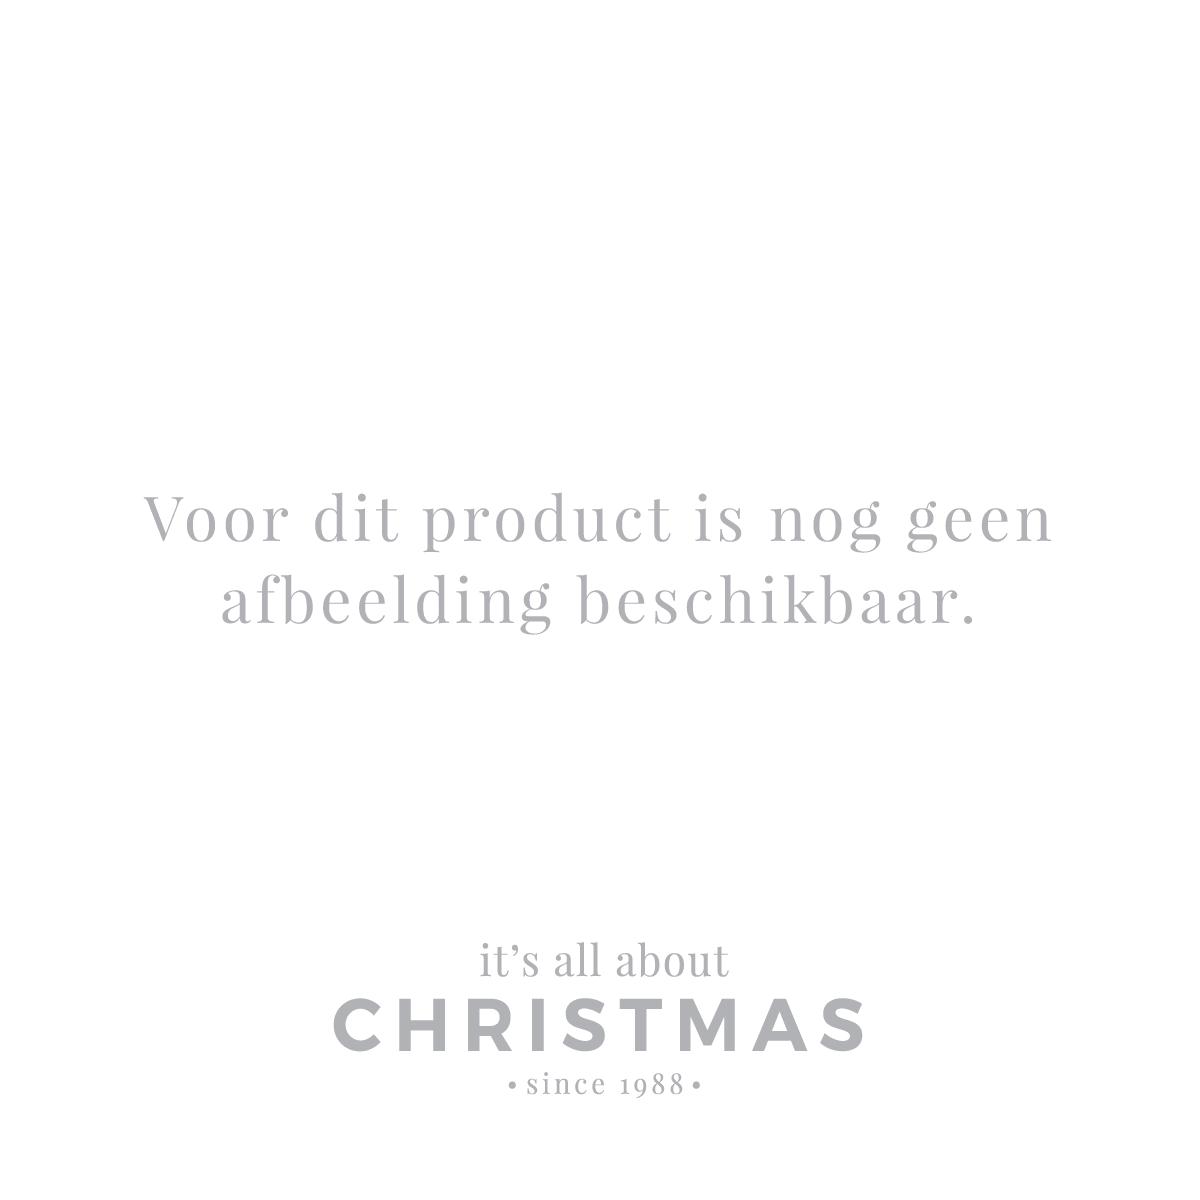 12 Christbaumschmuck Sterne bronze, Kunststoff, 10 cm